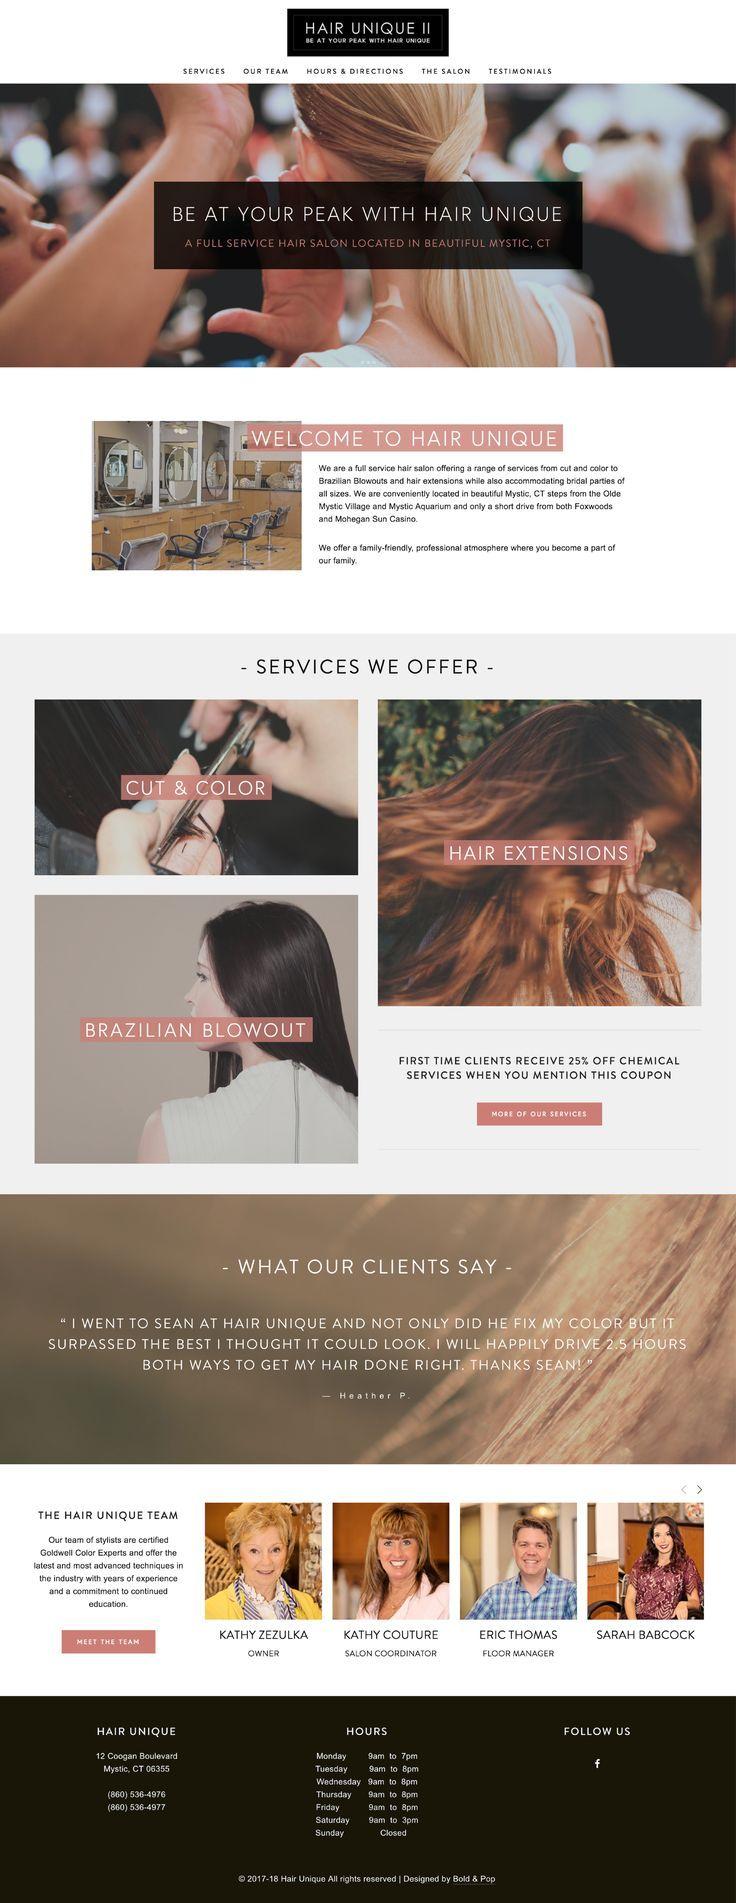 Hair Unique Website Design Bold Pop Social Media Branding And Squarespace Website Design Hair Salon Website Design Squarespace Website Design Website Design Inspiration